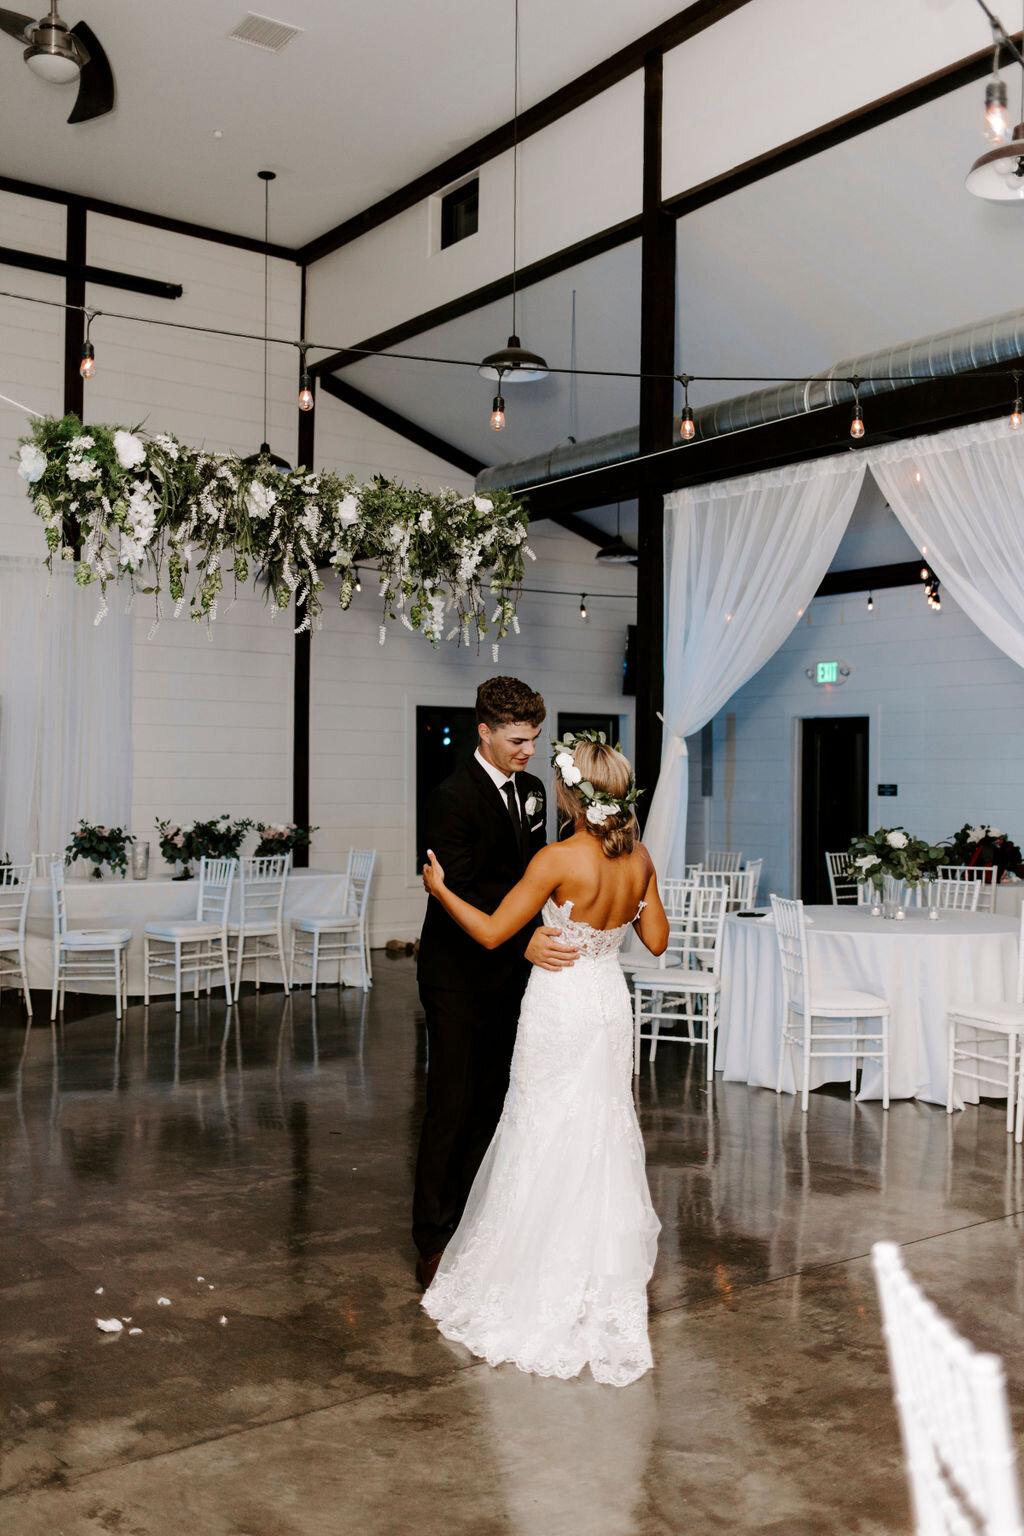 Tulsa White Barn Wedding Venue Outdoor Ceremony 131.jpg